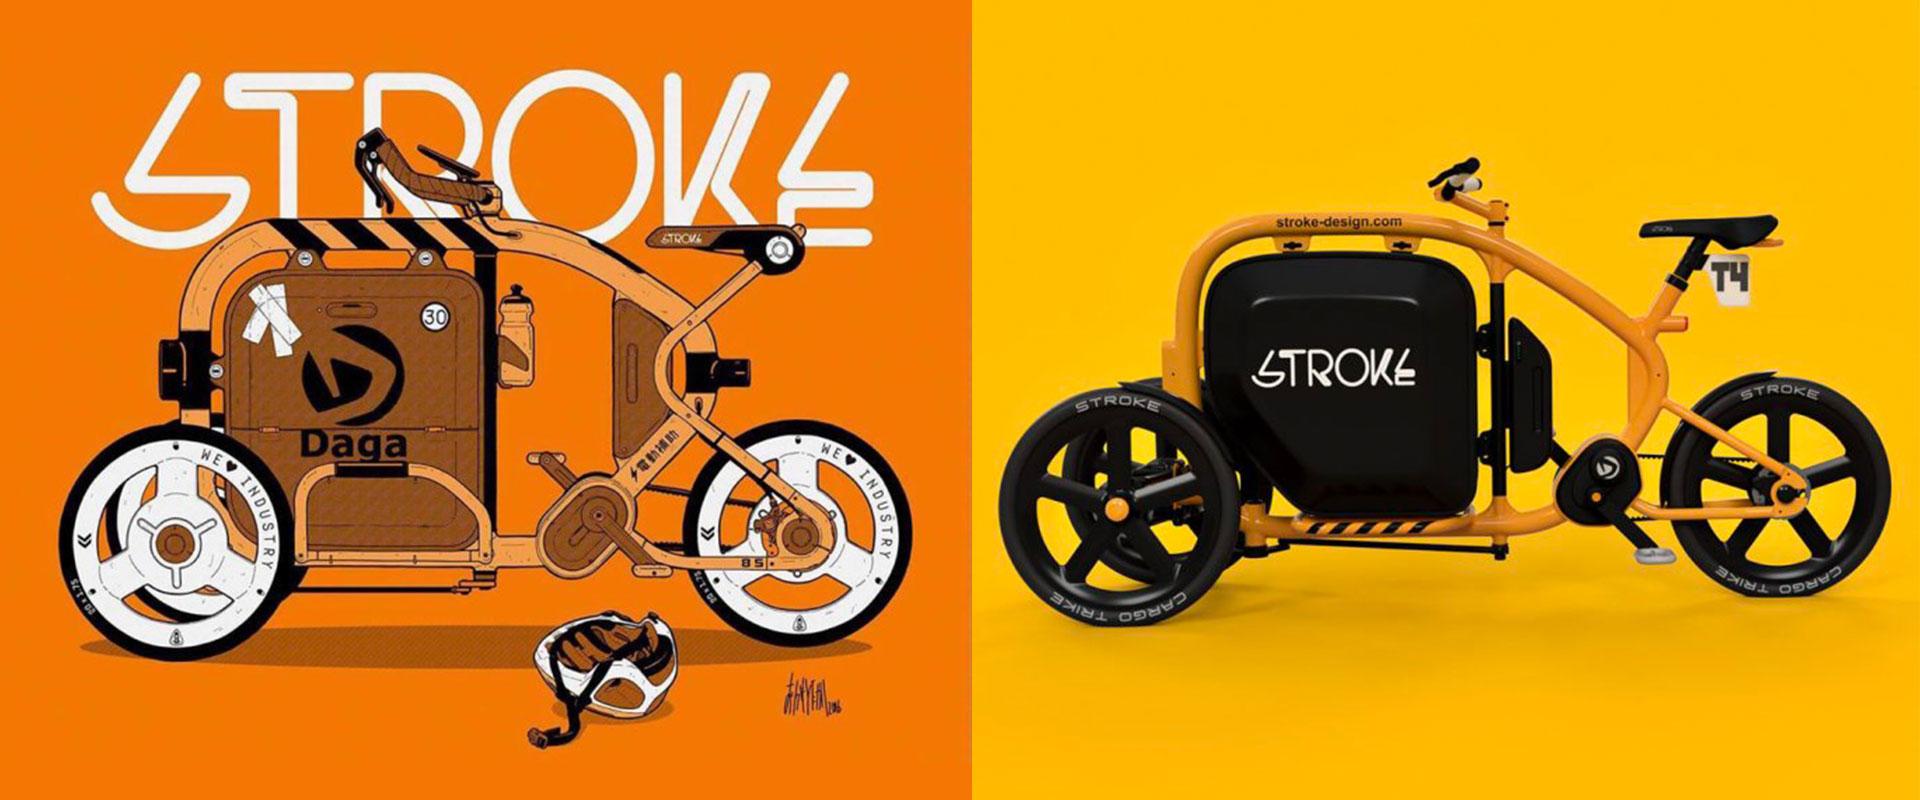 STROKE Electric CARGO TRIKE from Japan | EvNerds